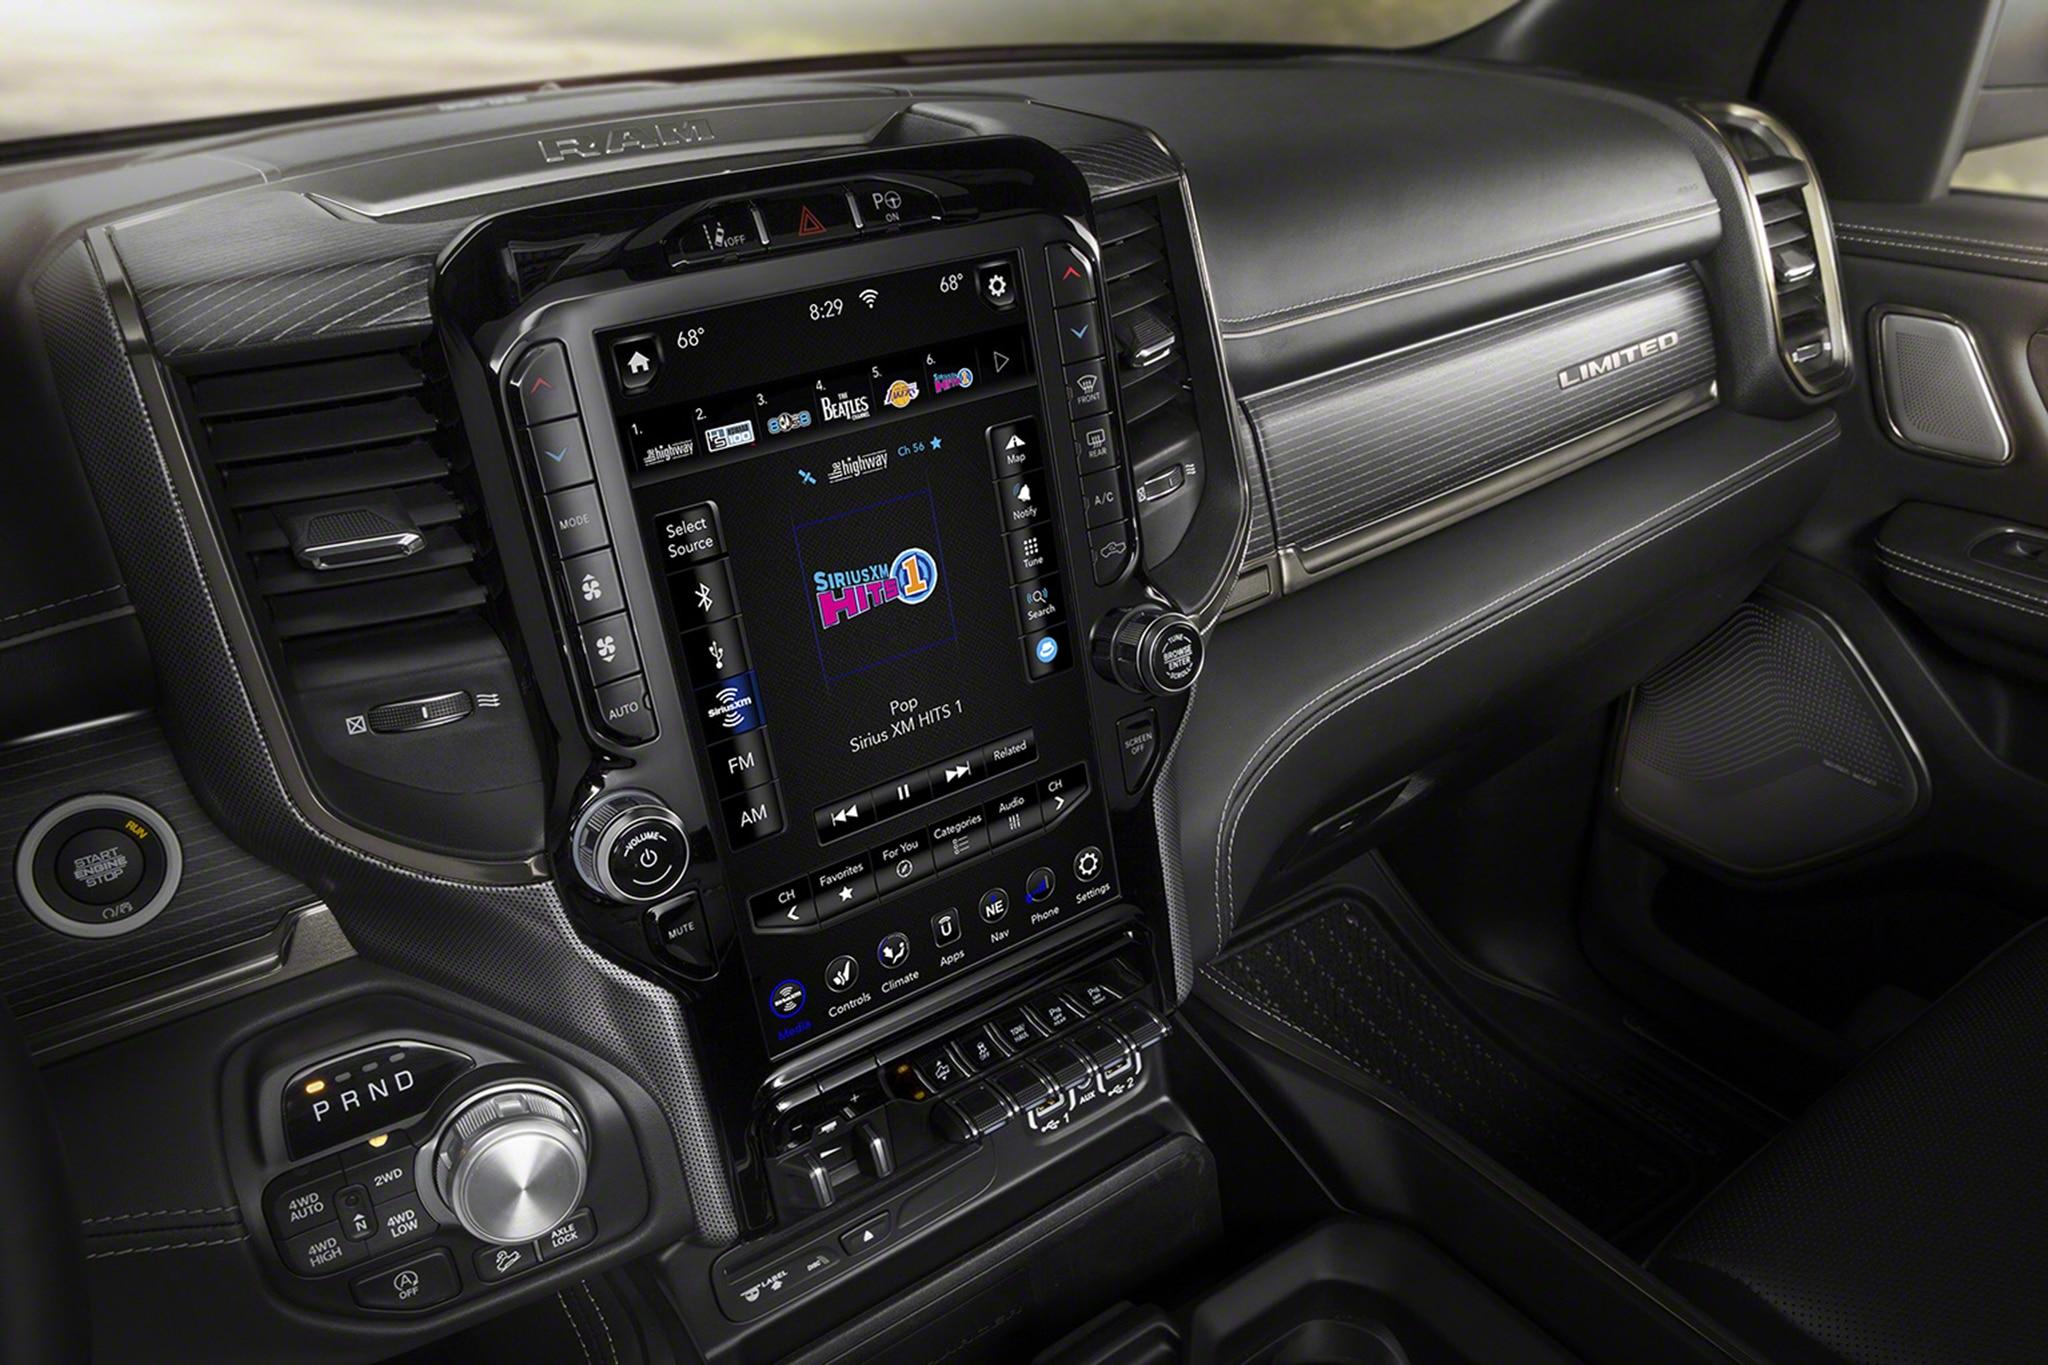 63 Power Wagon >> Legacy Classic Trucks Dodge Power Wagon Defines Custom Off-Road Badassery | Automobile Magazine